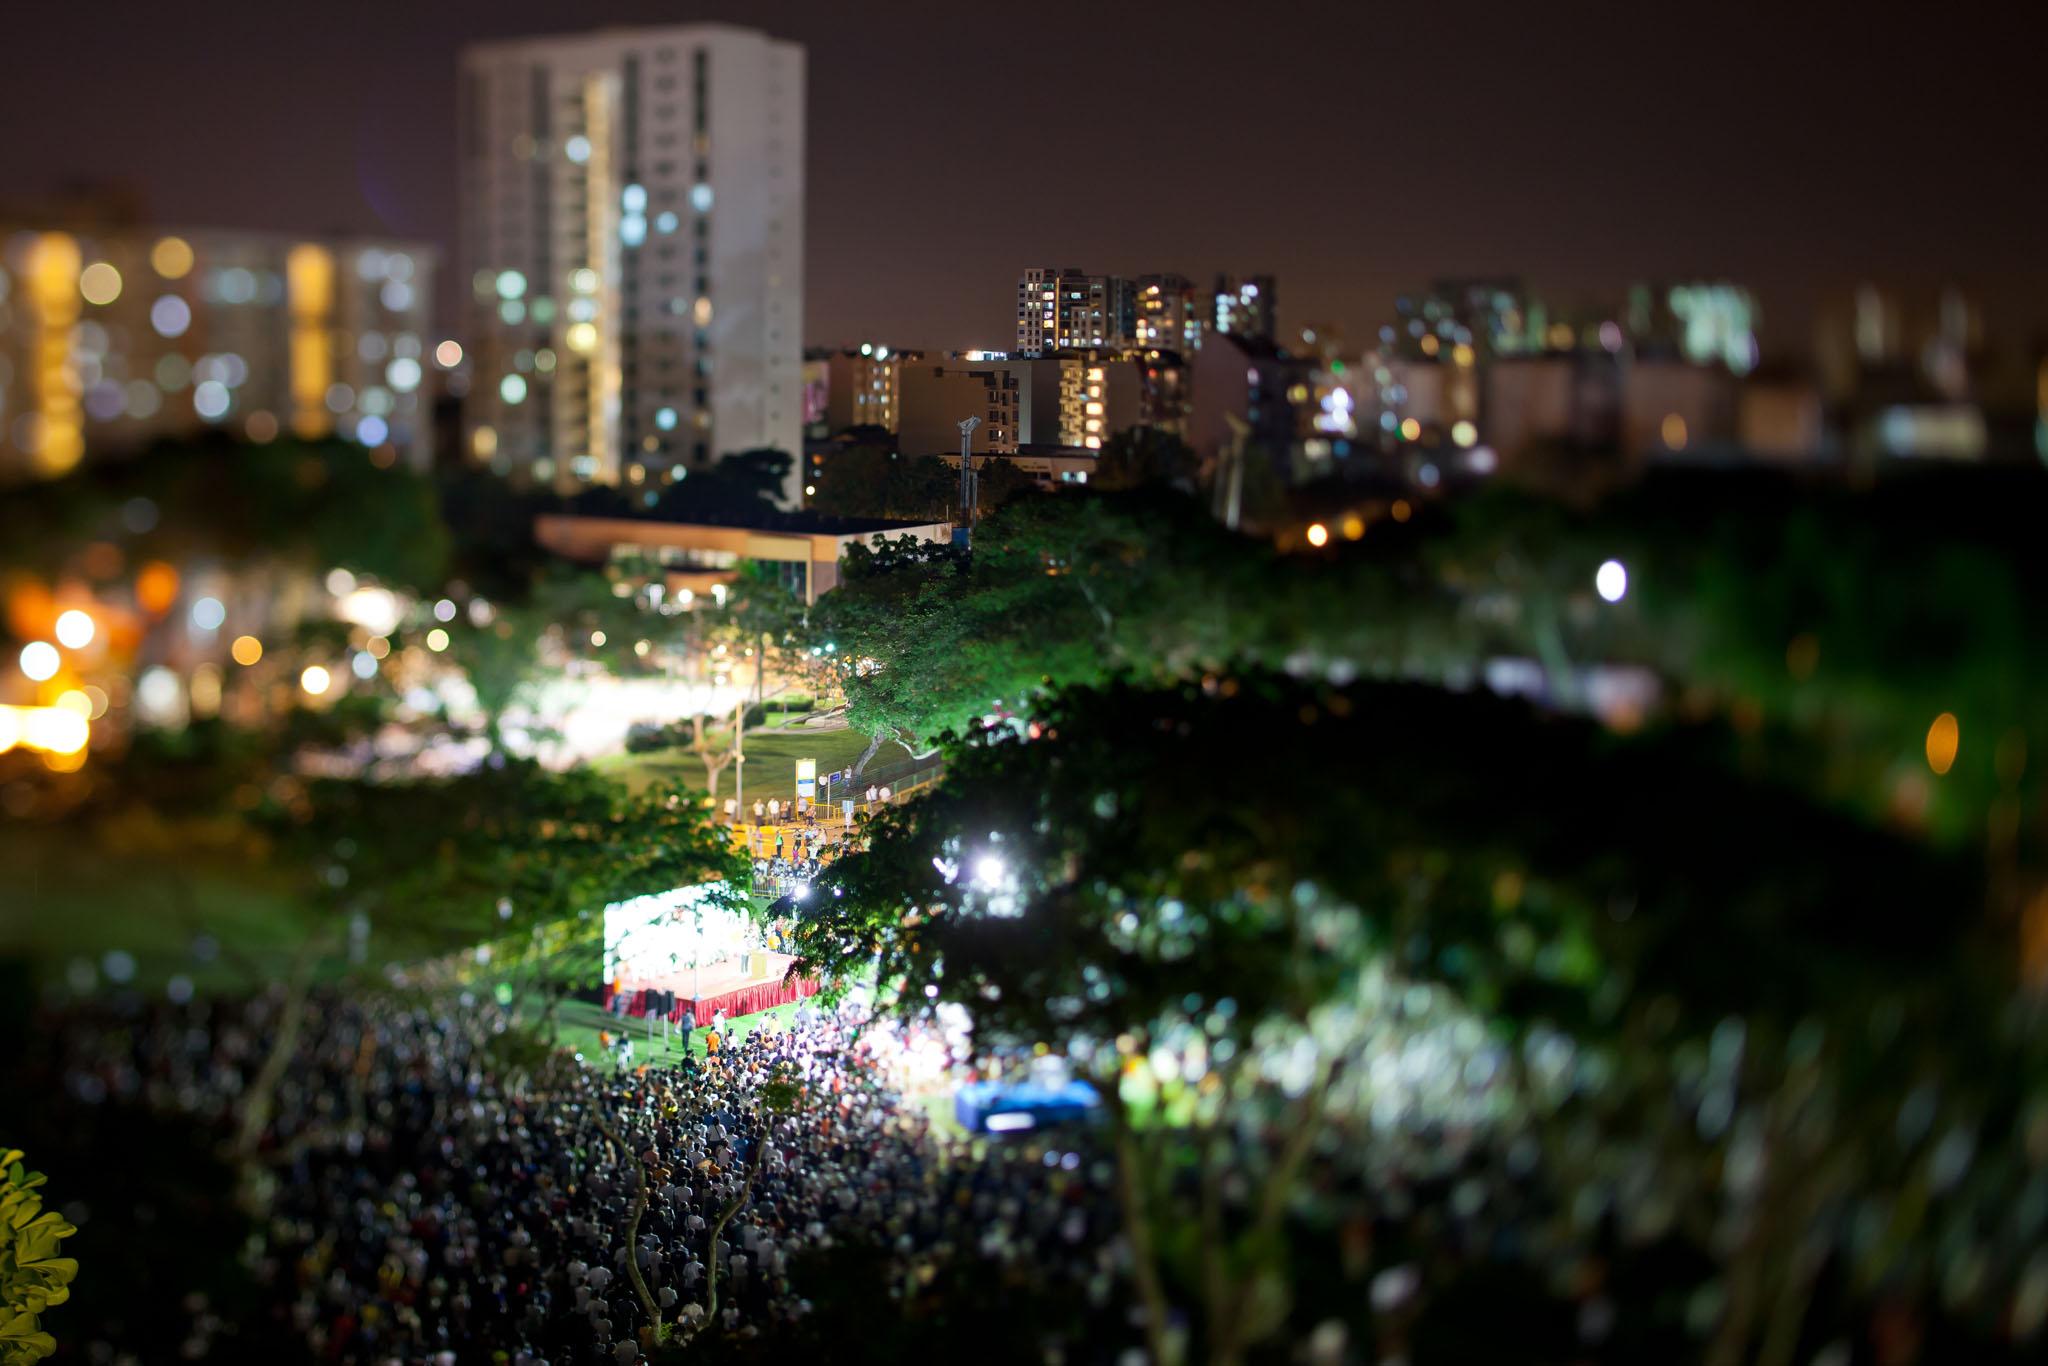 singapore-commercial-photographer-editorial-documentary-tiltshift-singaplural-zakaria-zainal-07.jpg